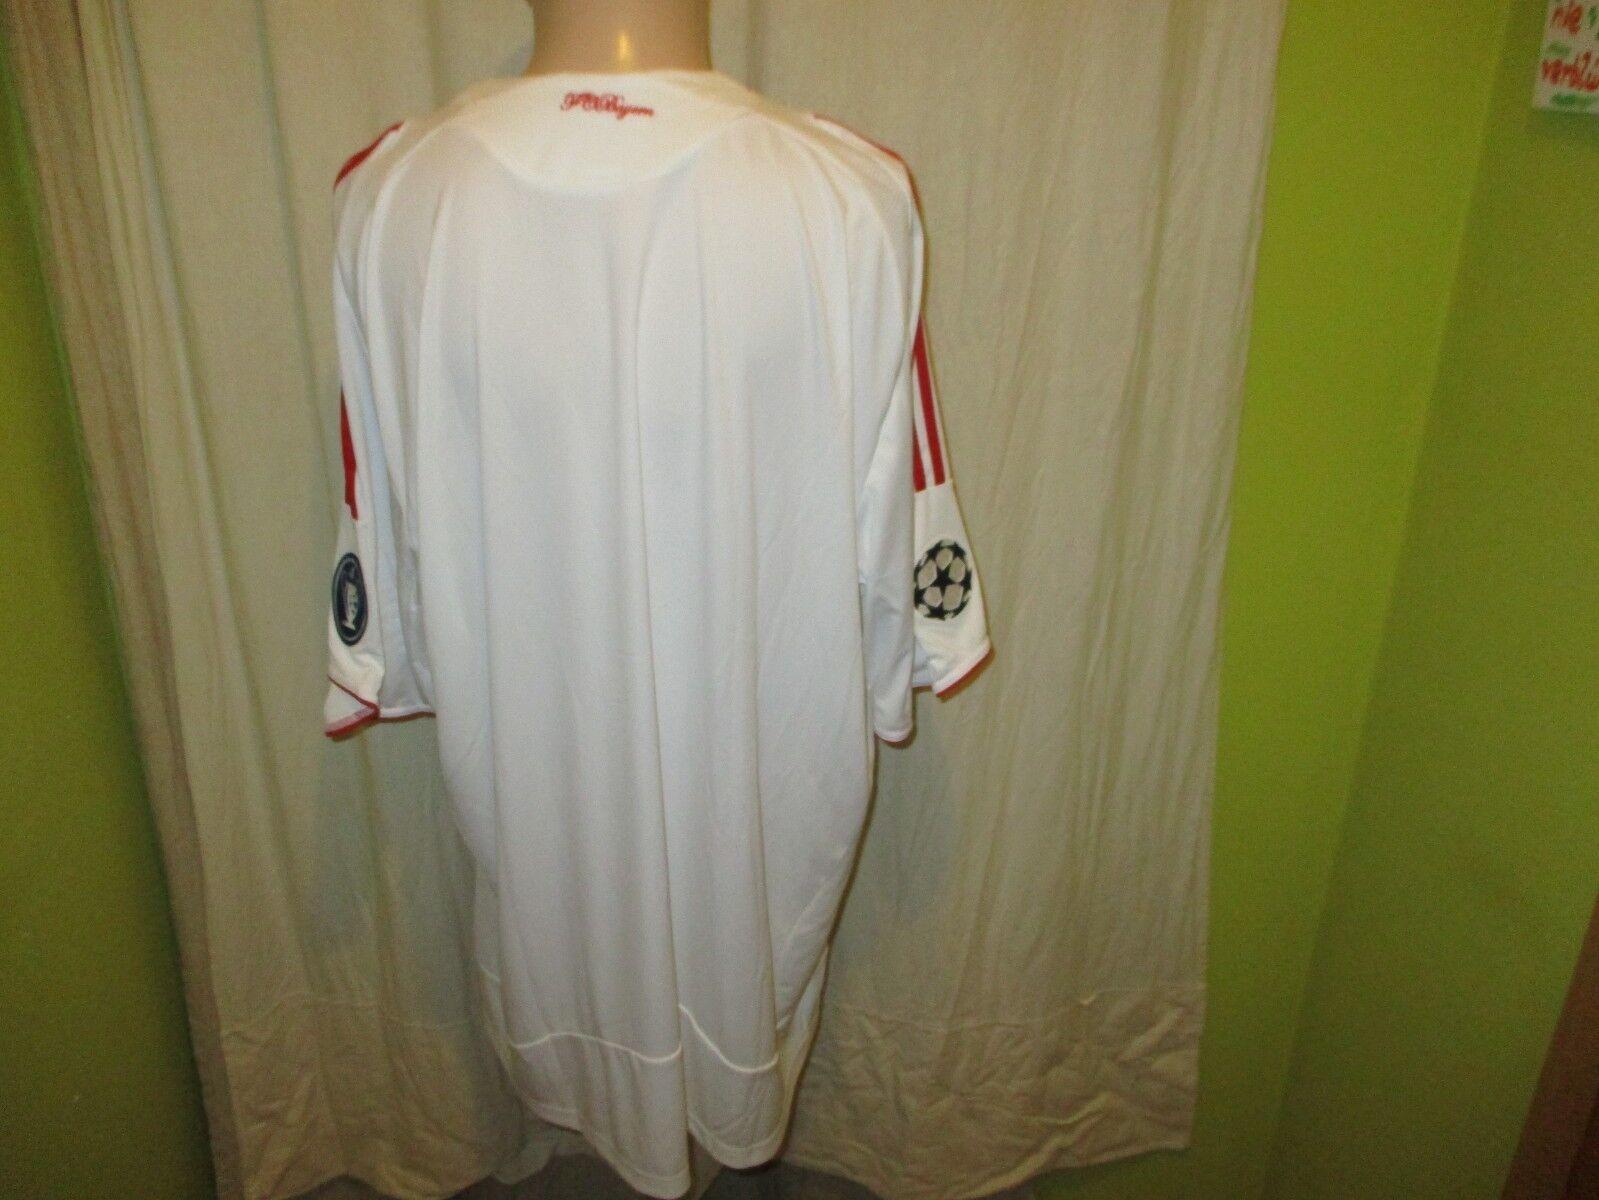 FC Bayern München Adidas Champions League Trikot 08 09 T